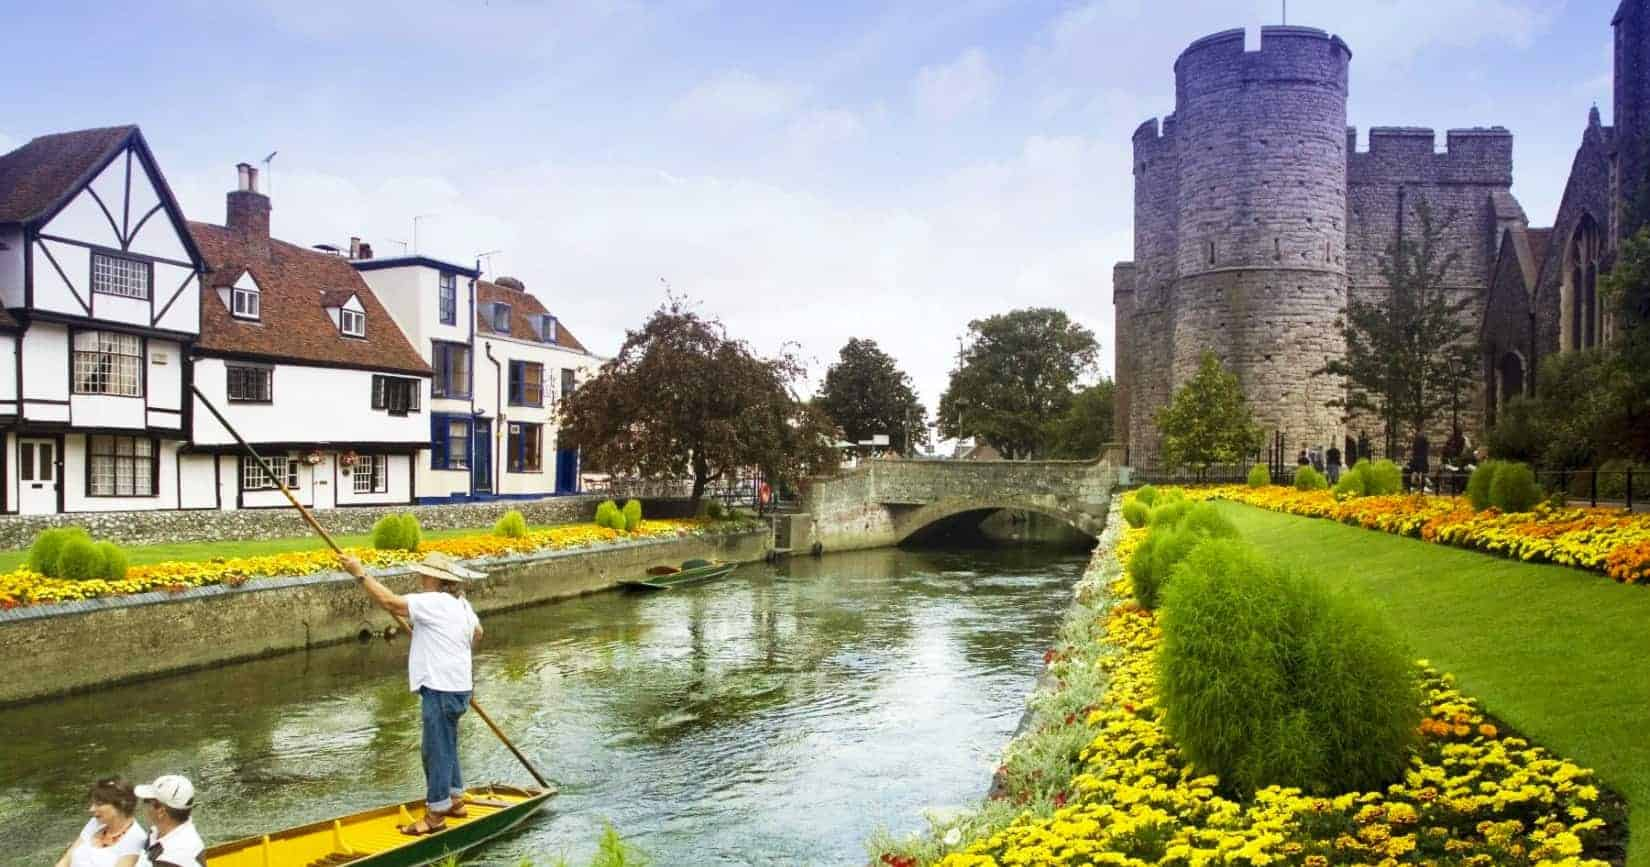 Canterbury, ReisDit.no, Toppfoto: Michael Pead / Wikipedia CC-BY-SA-2.0-uk